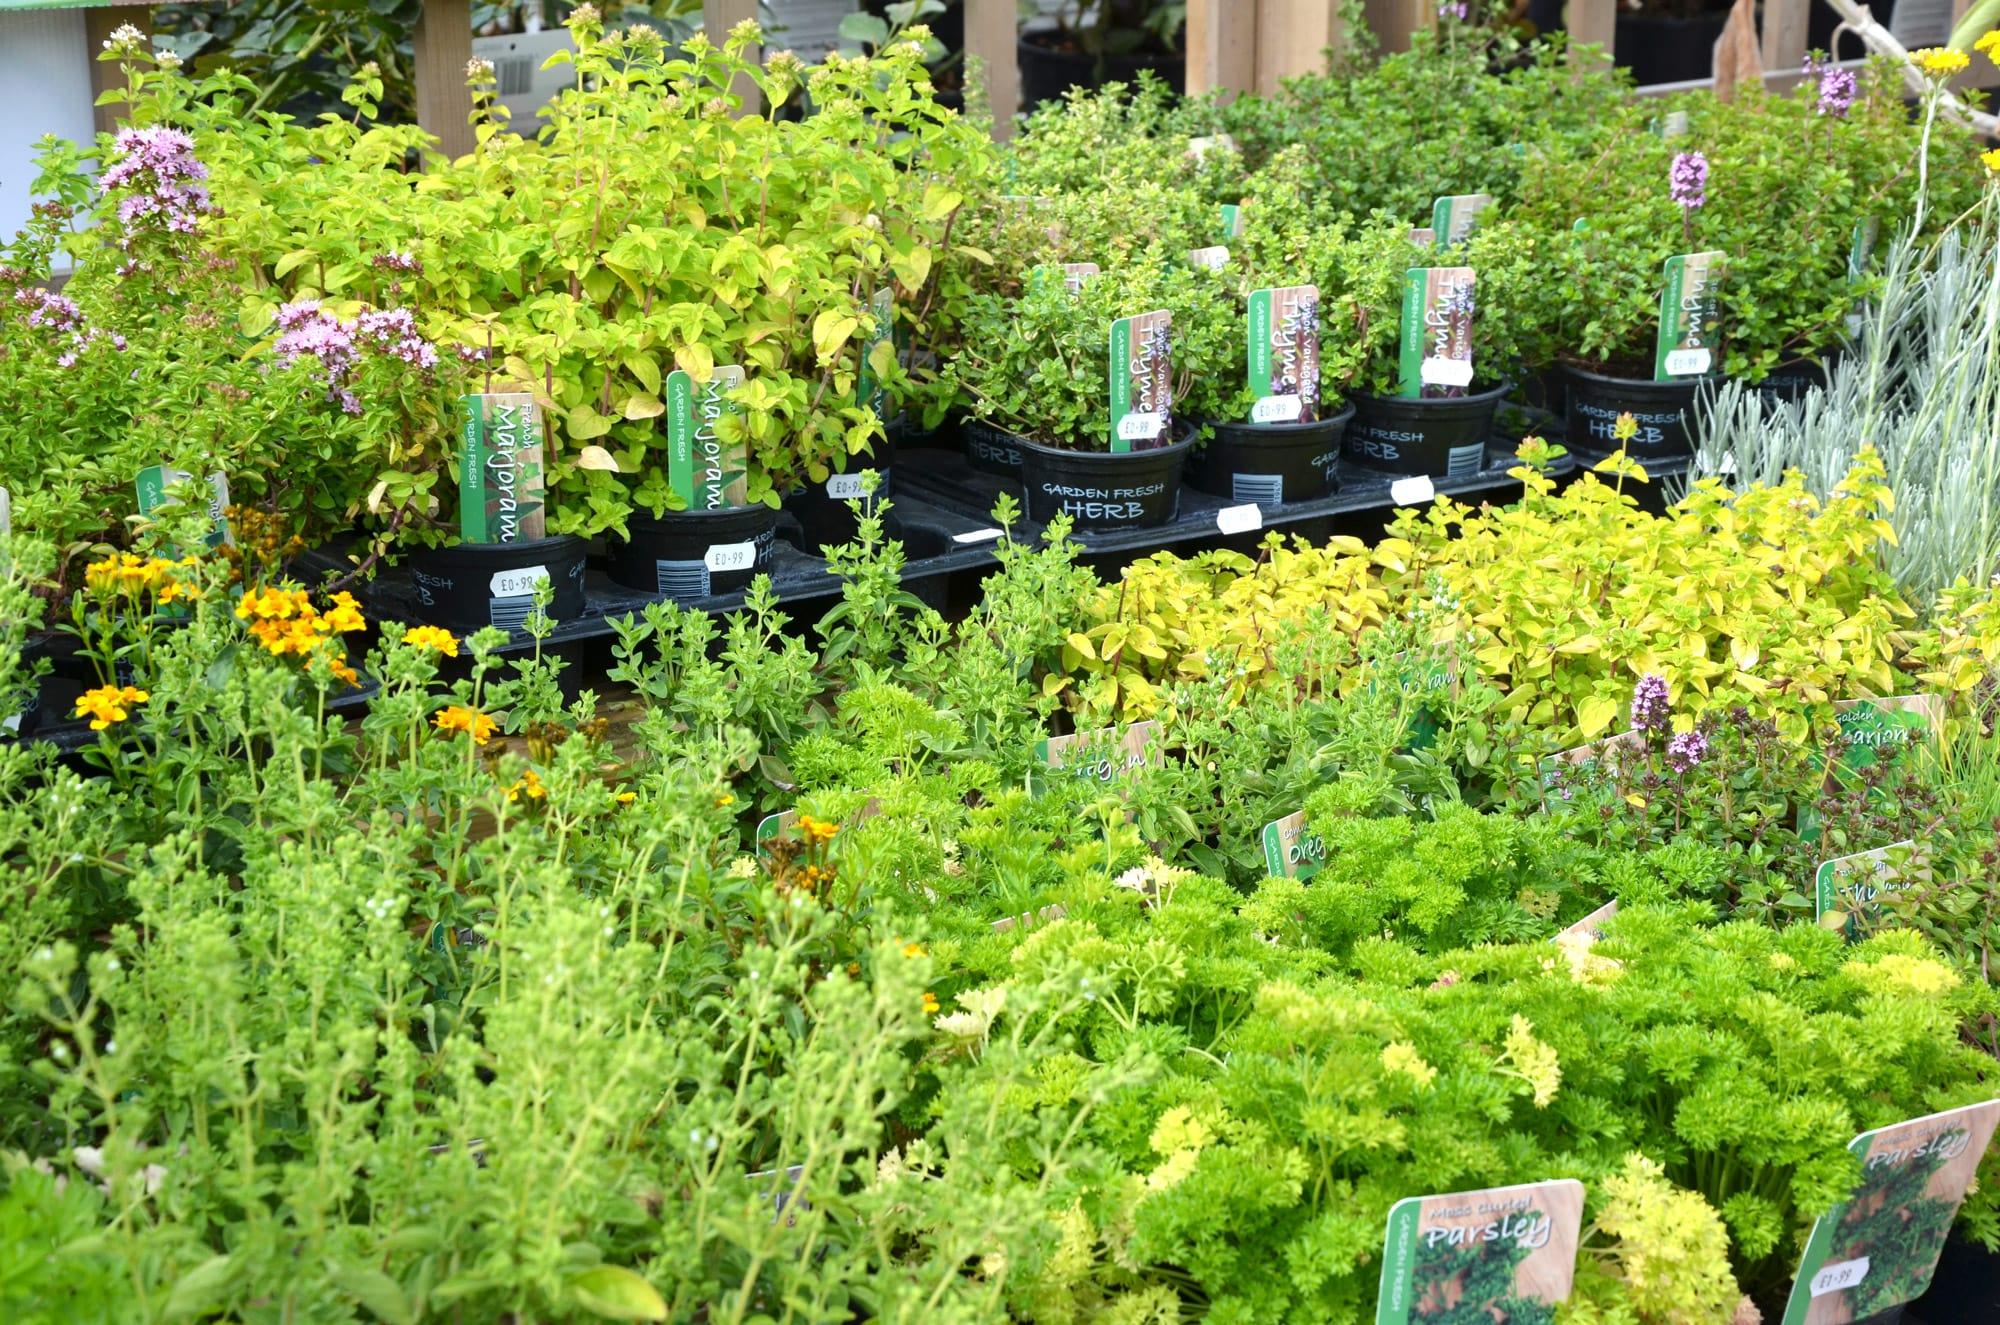 Lower-barn-gardencentre-herbs-min.jpg